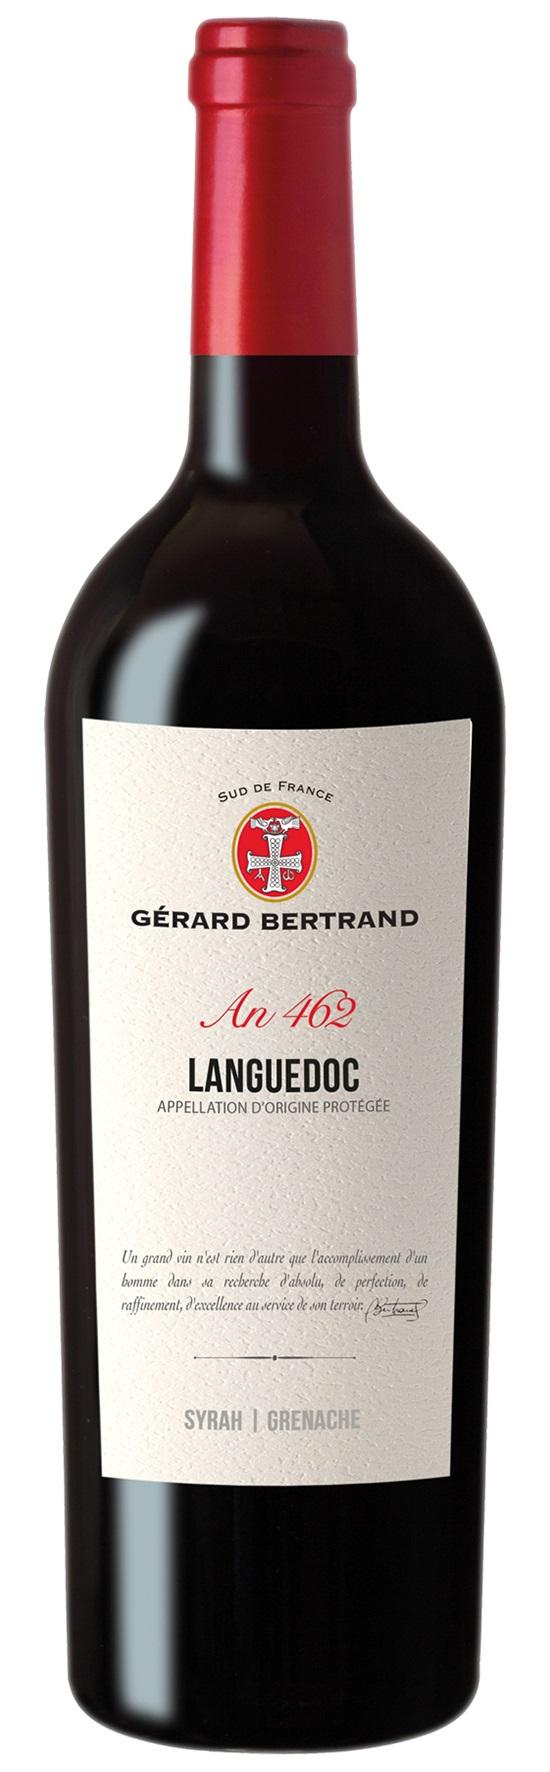 Heritage An 462 Languedoc AOP